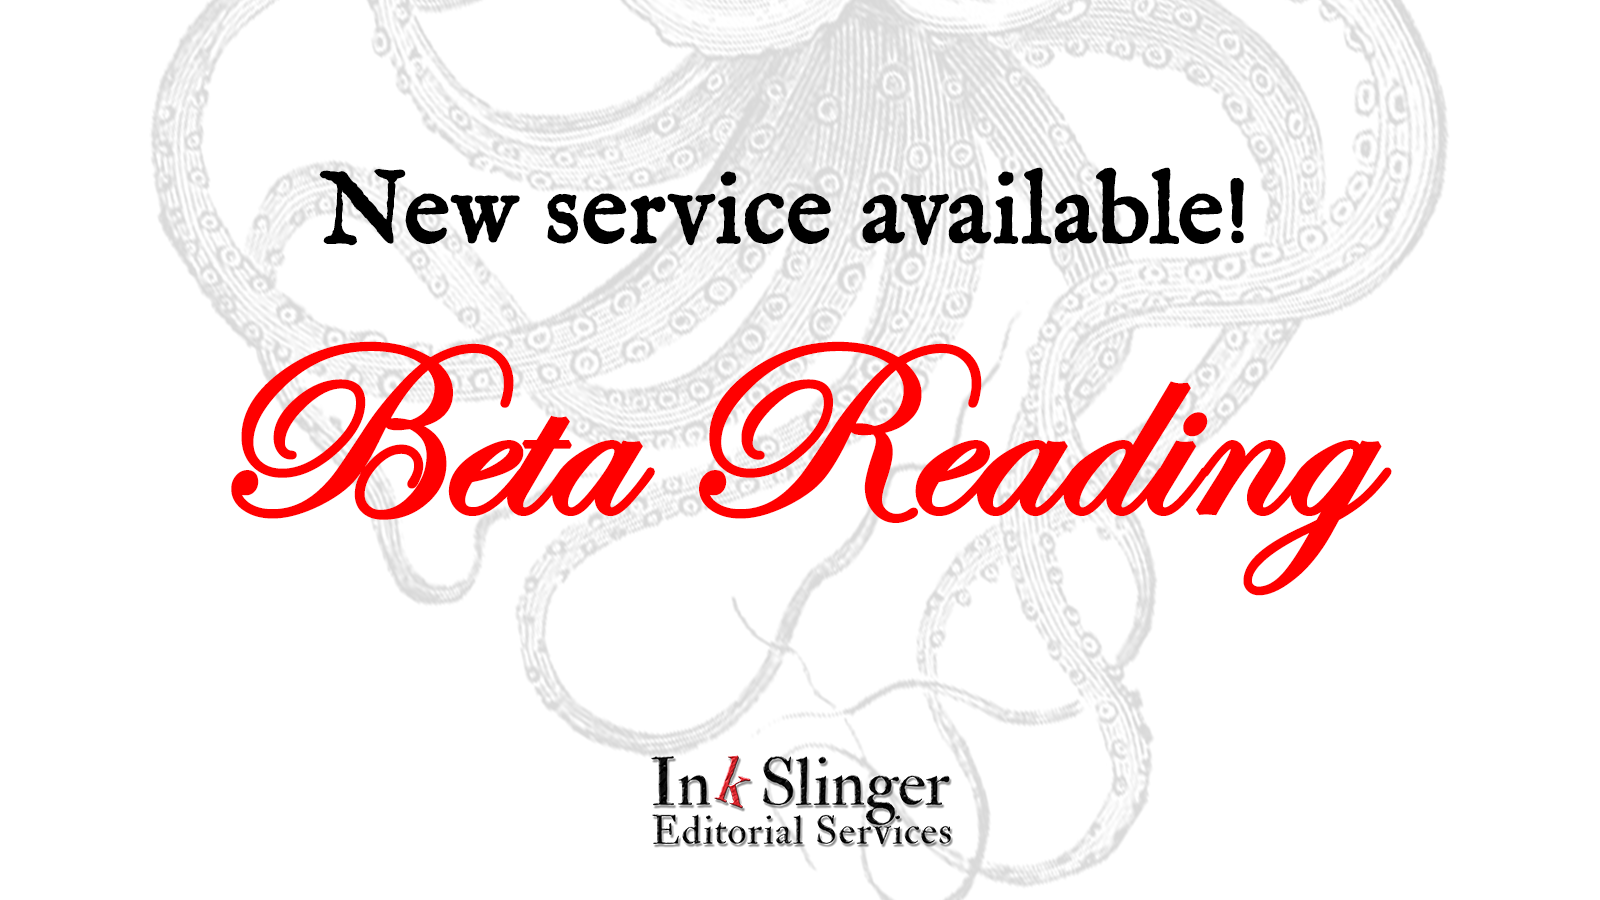 New Service: Beta Reading